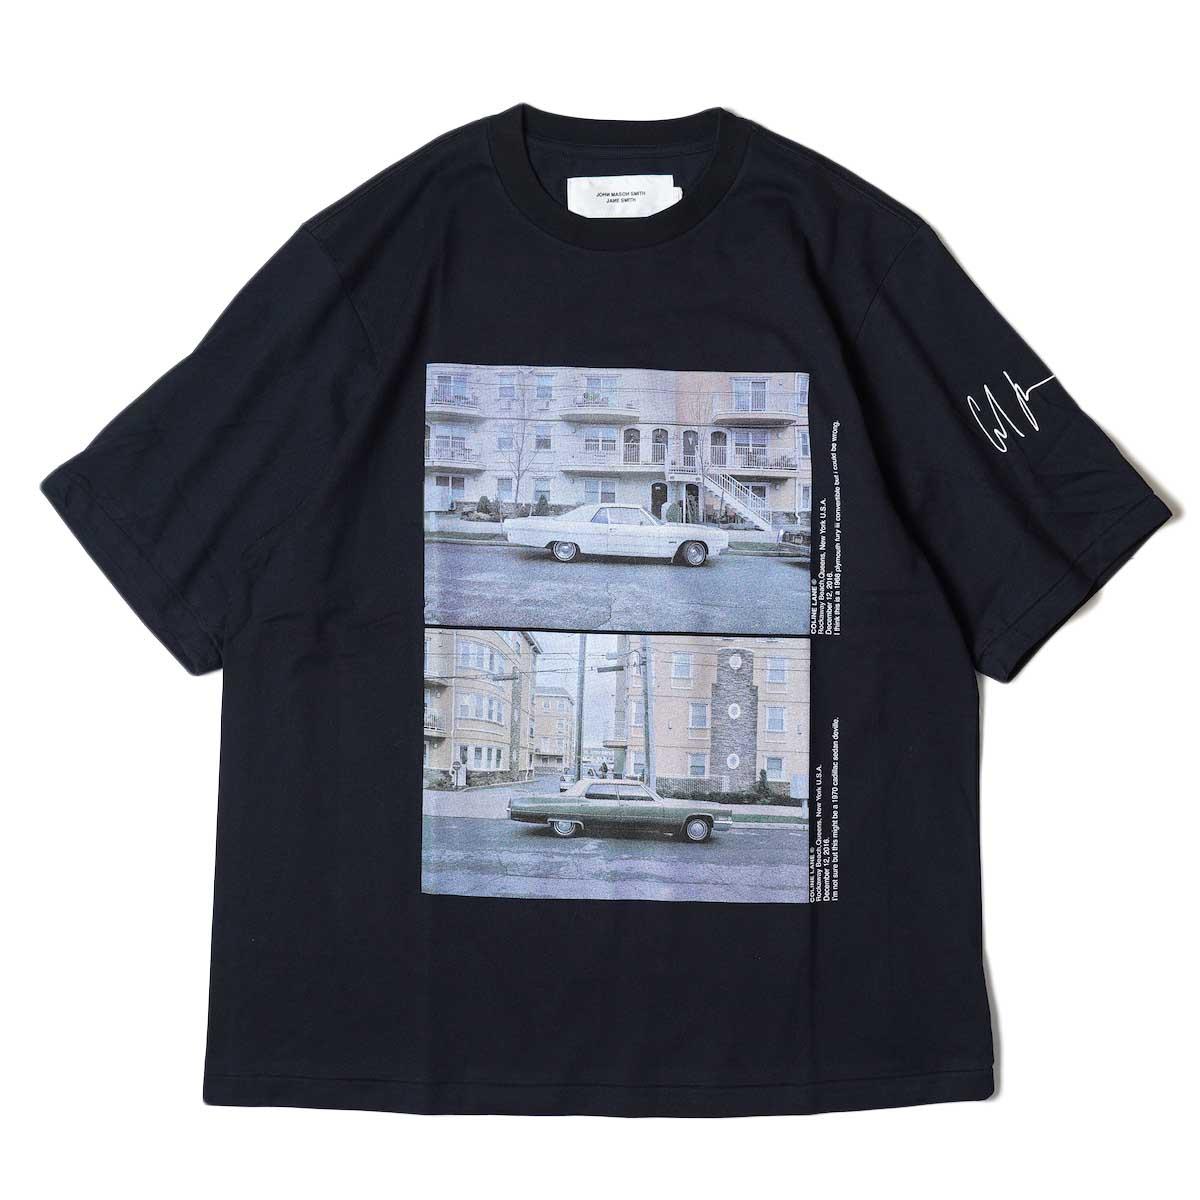 JANE SMITH / CADILLAC PLYMOUTH S/S T-Shirt (Black)